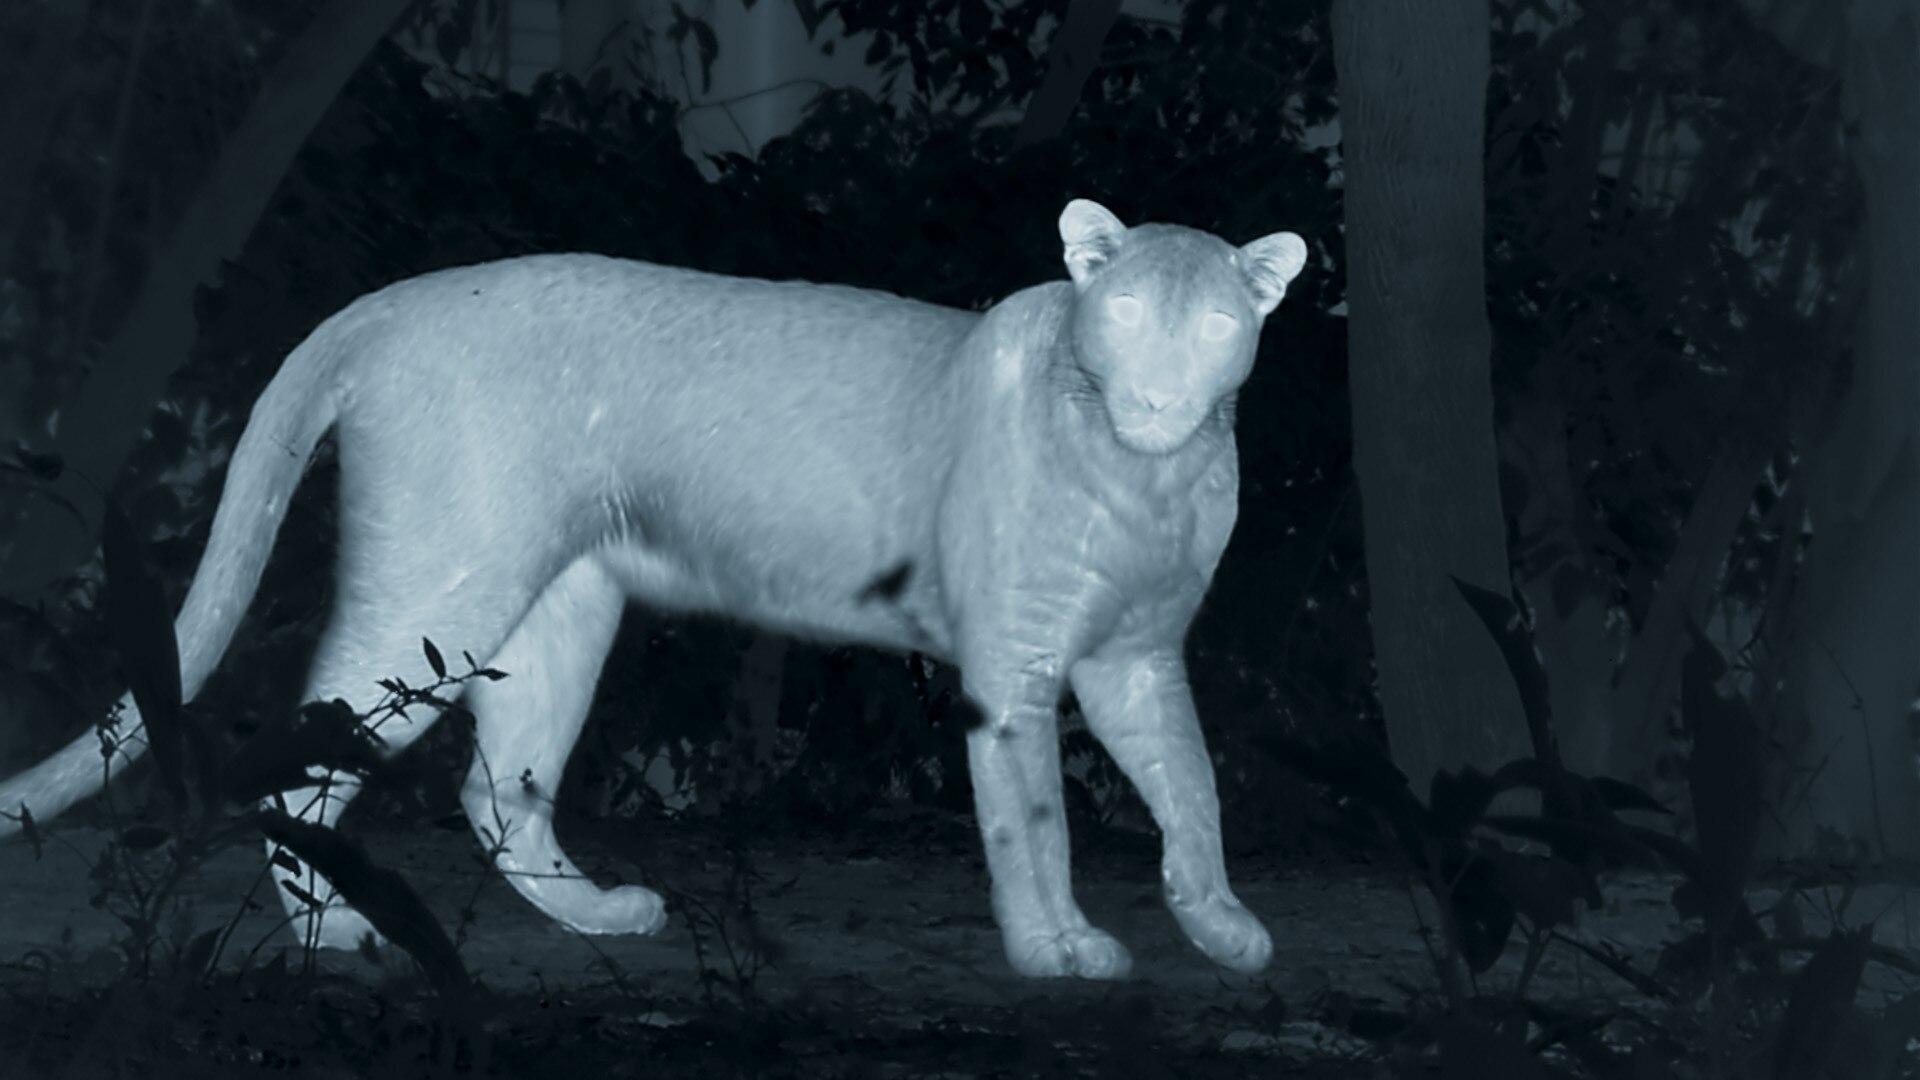 Leopard on night vision camera